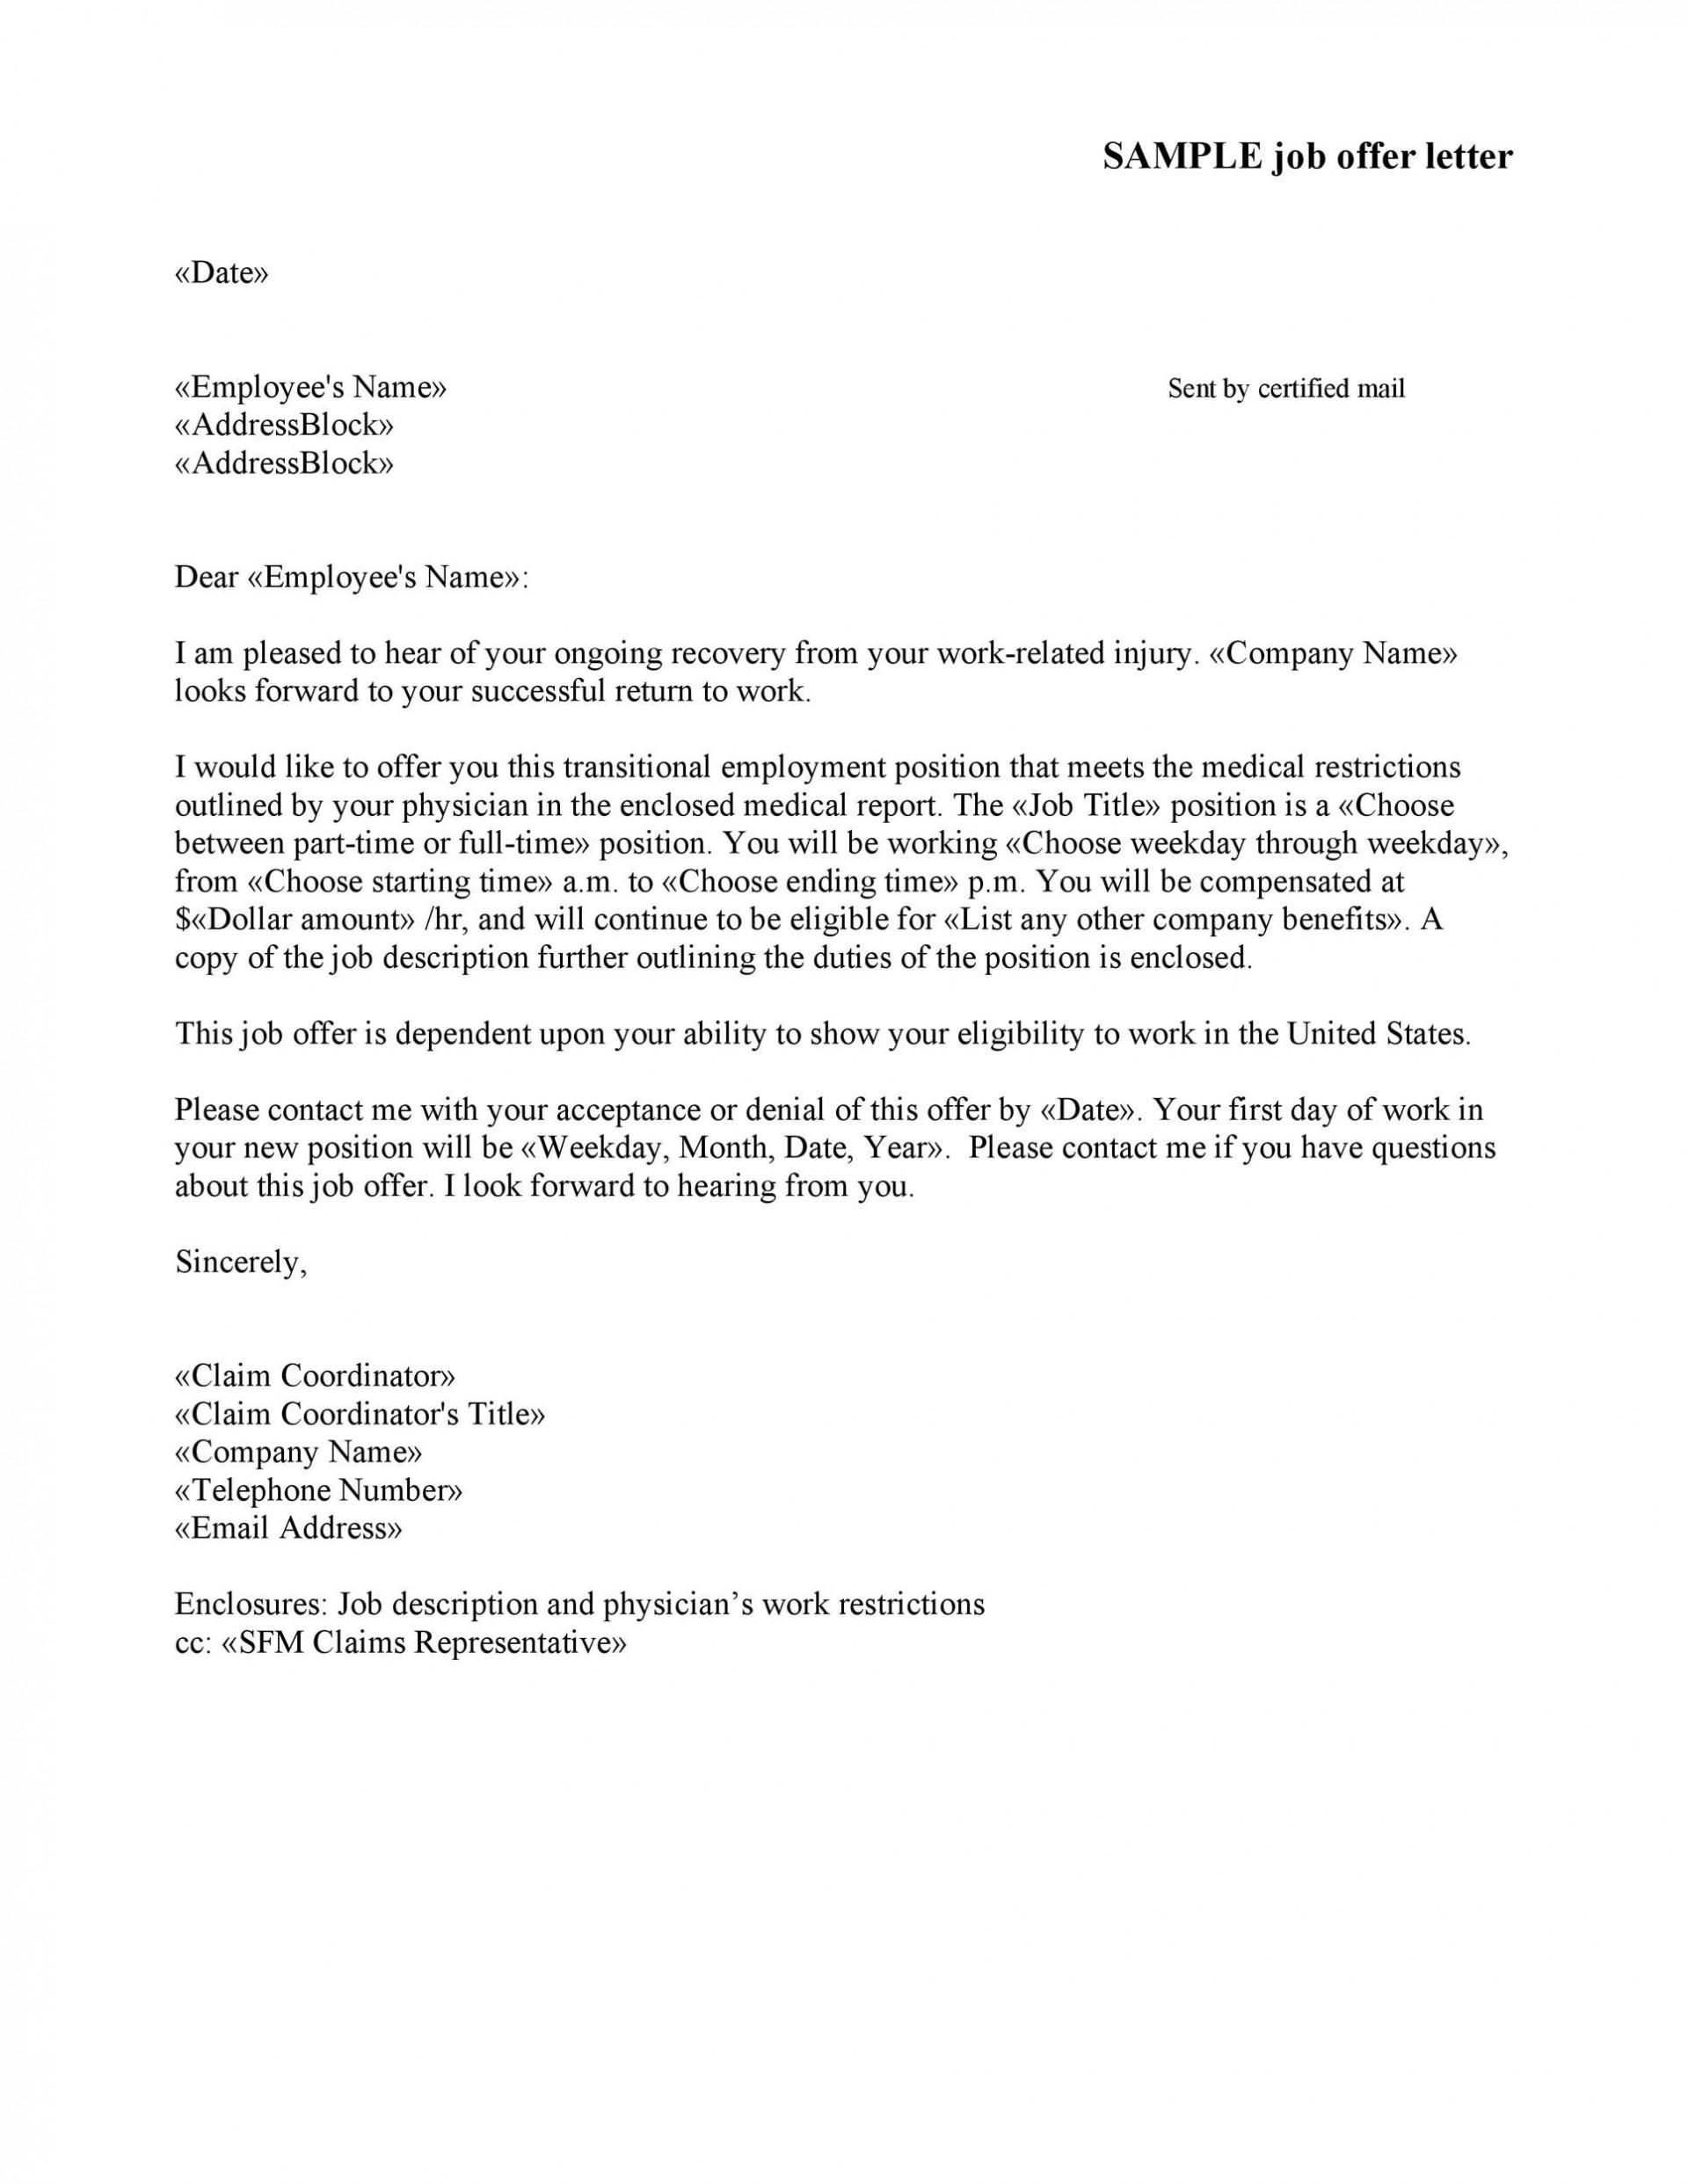 007 Sensational Counter Offer Letter Template Concept  Real Estate Settlement Debt1920